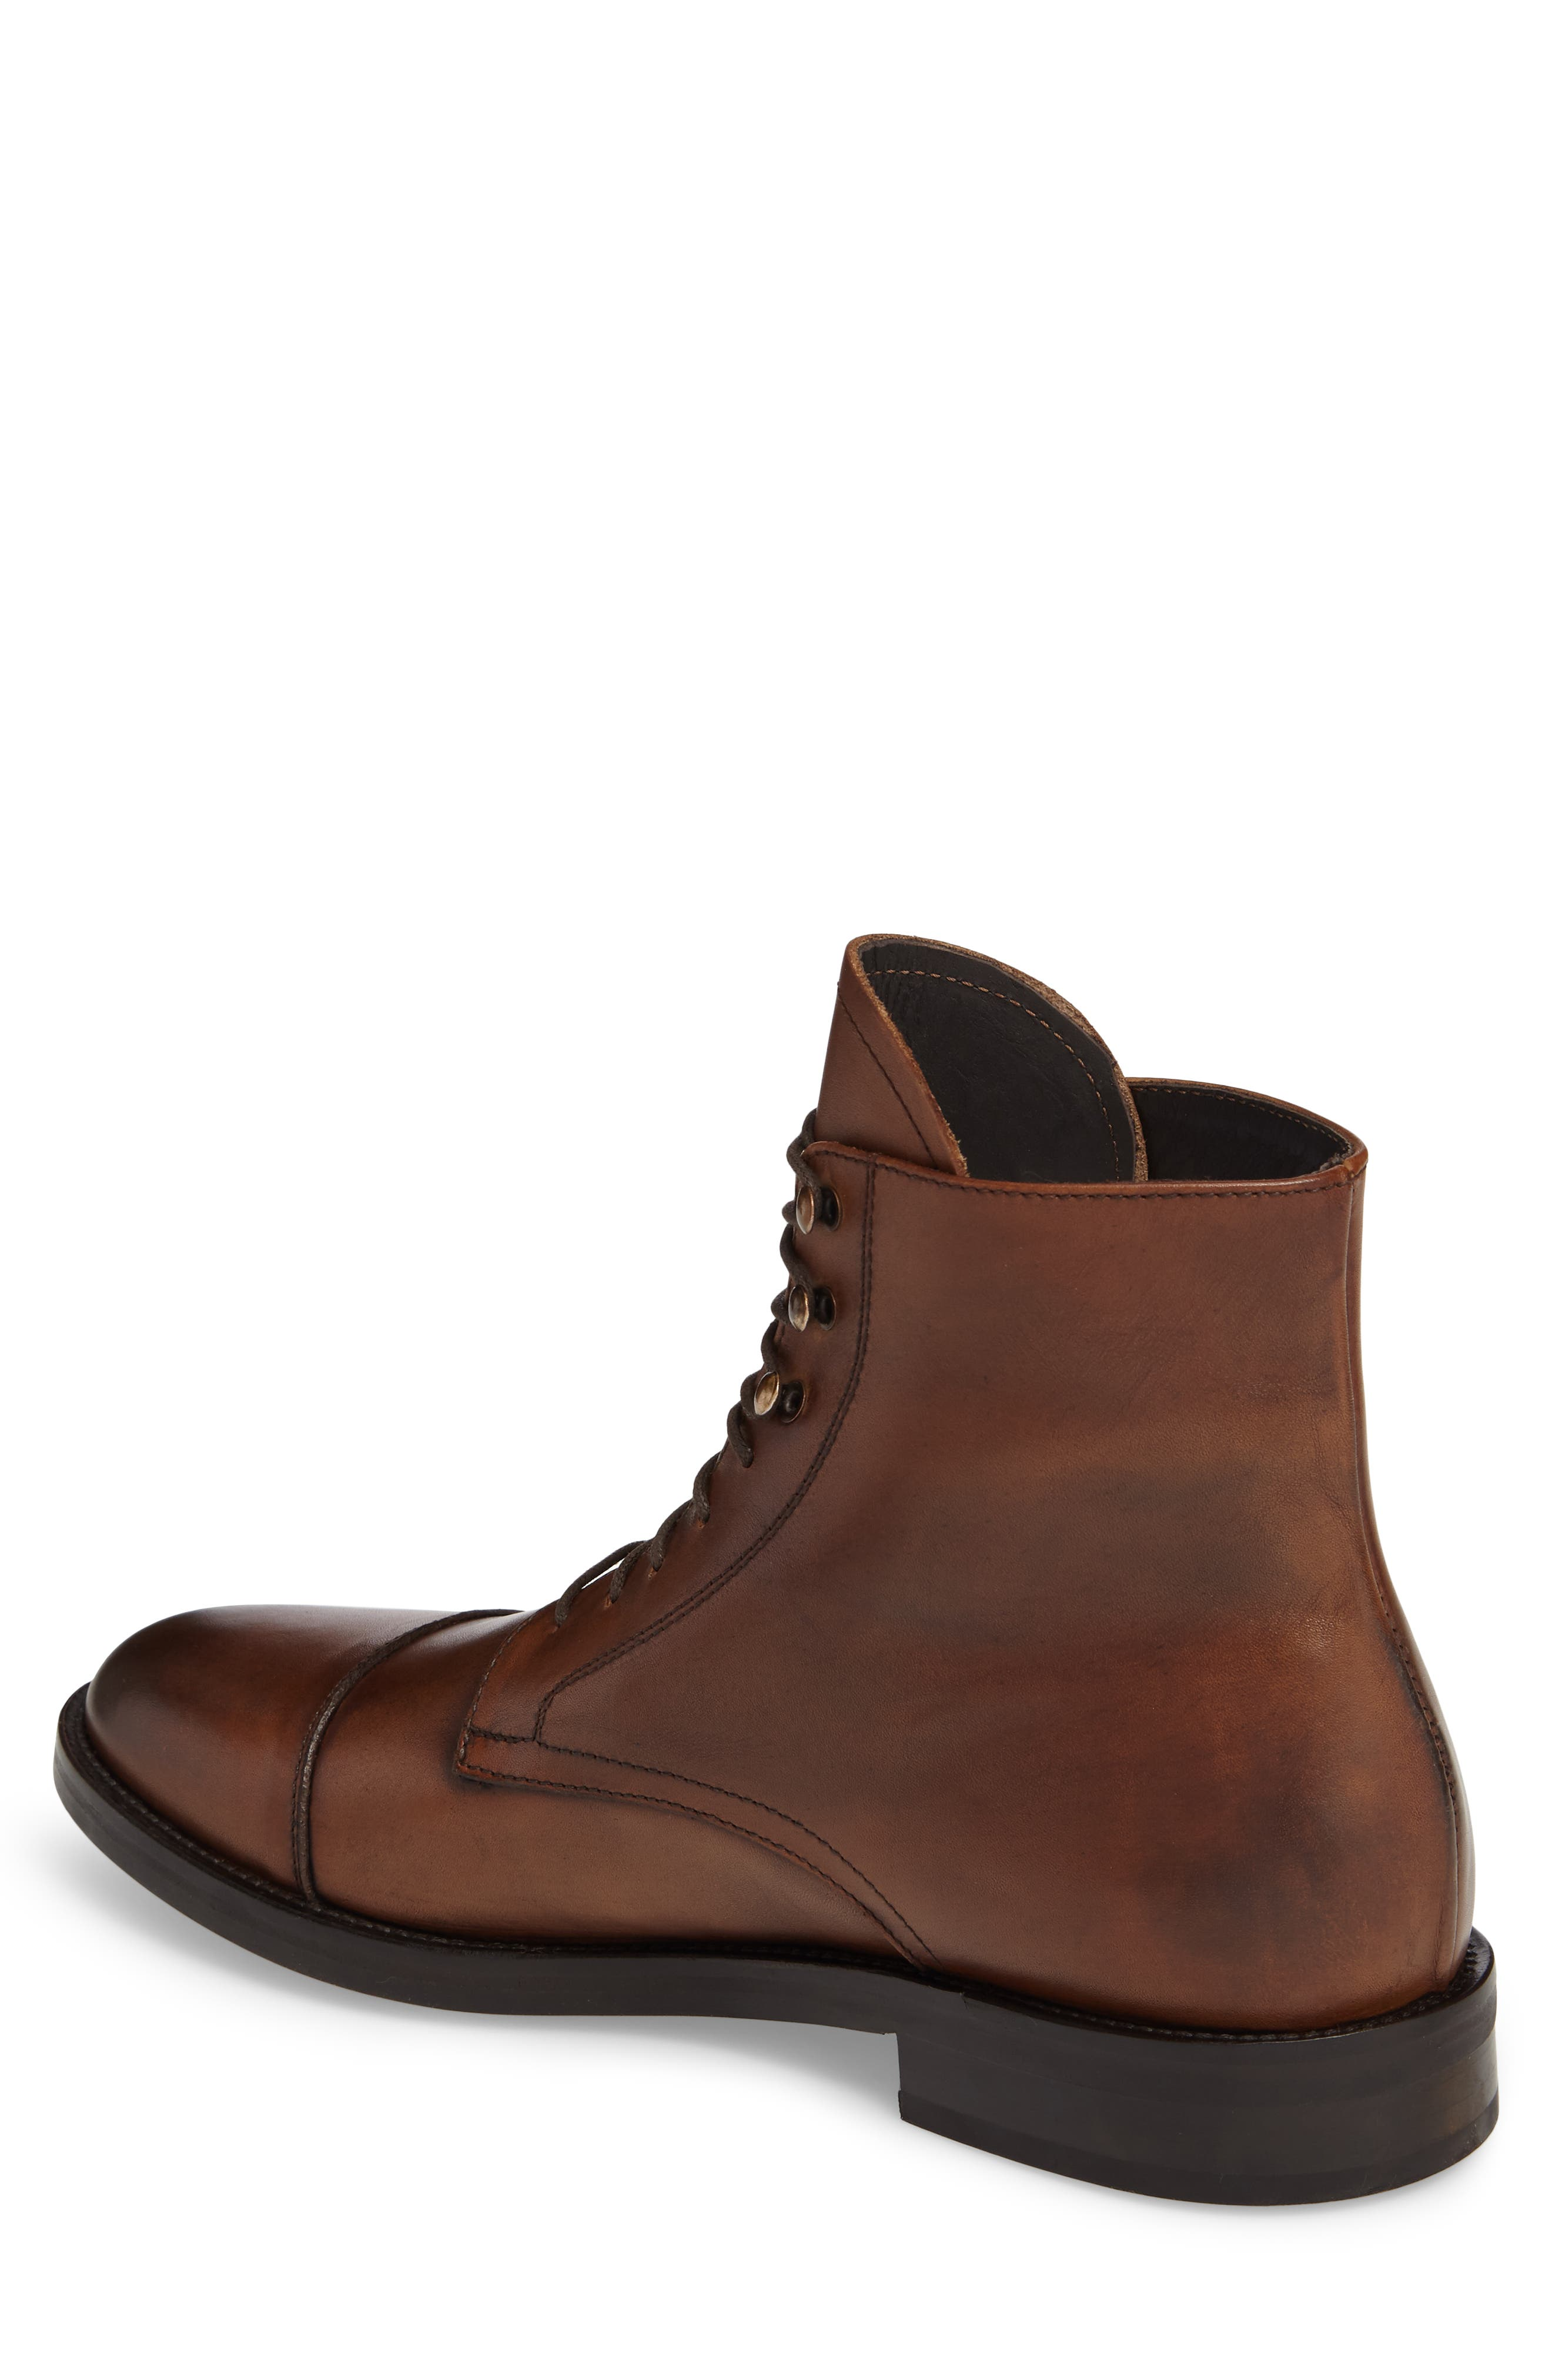 Alternate Image 2  - To Boot New York Henri Cap Toe Boot (Men)